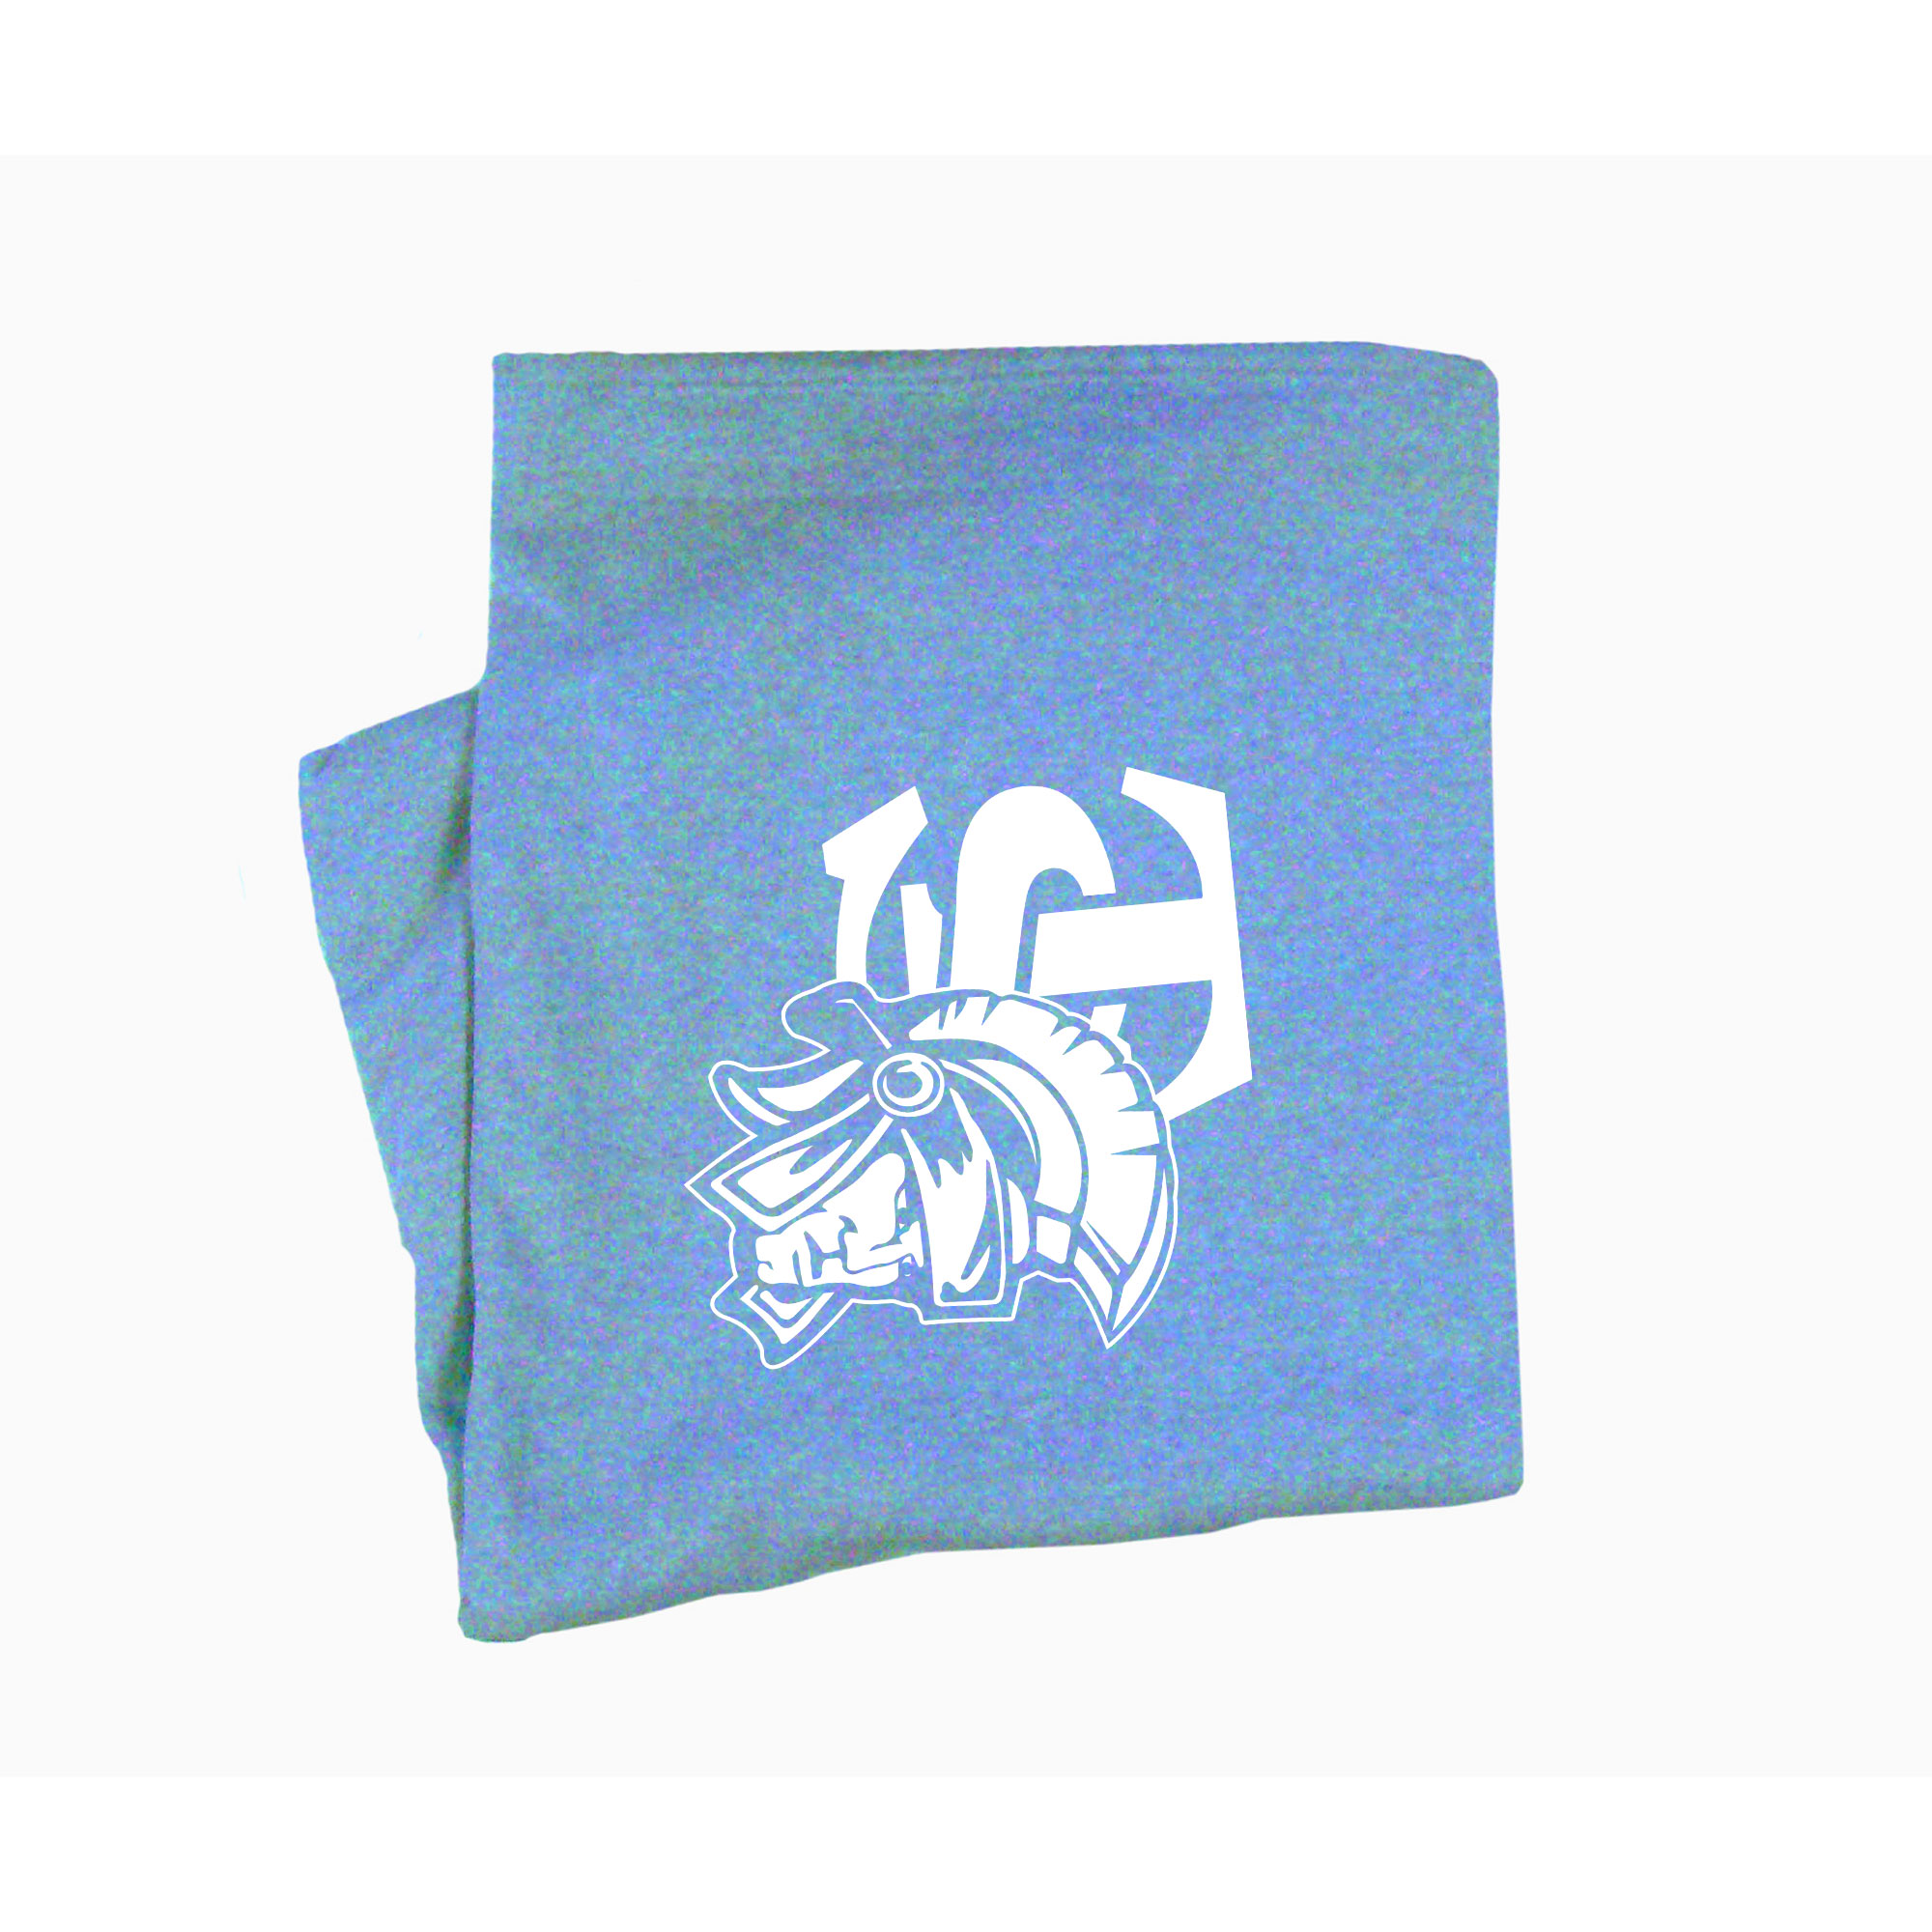 pro-weave sweatshirt blanket